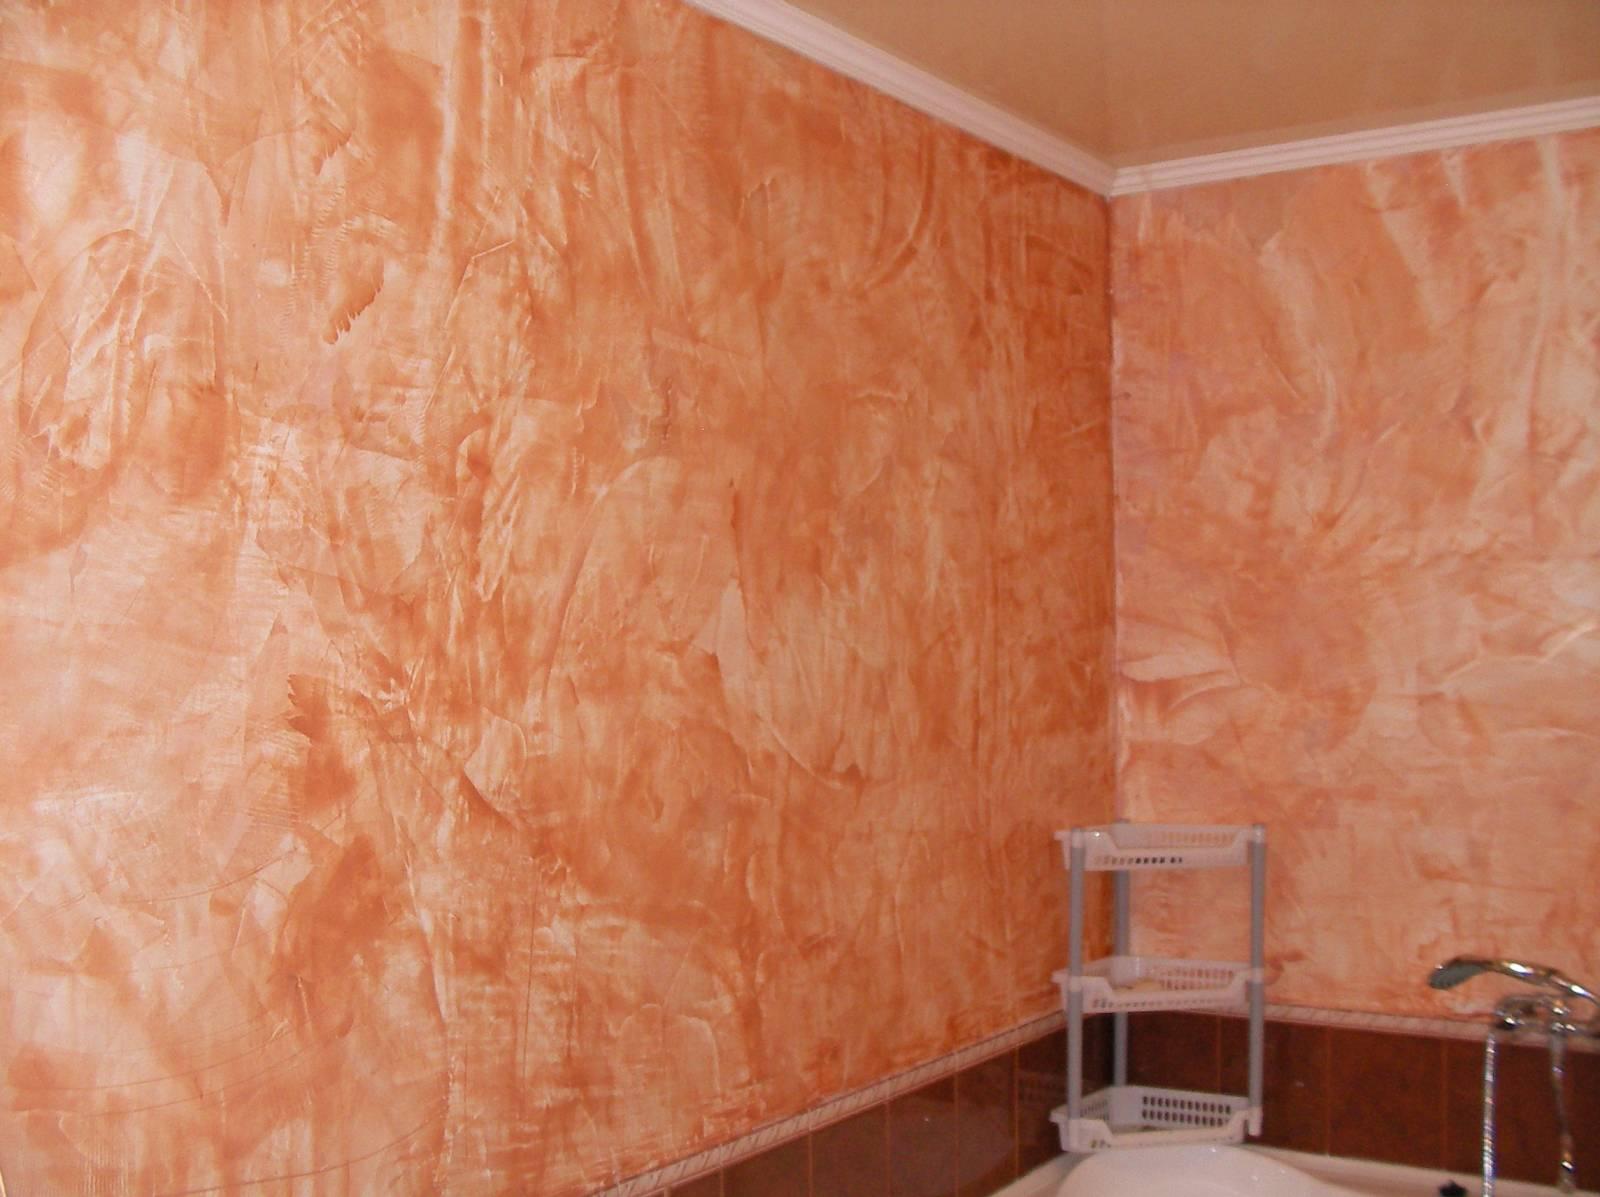 штукатурка ванной комнаты цементным раствором